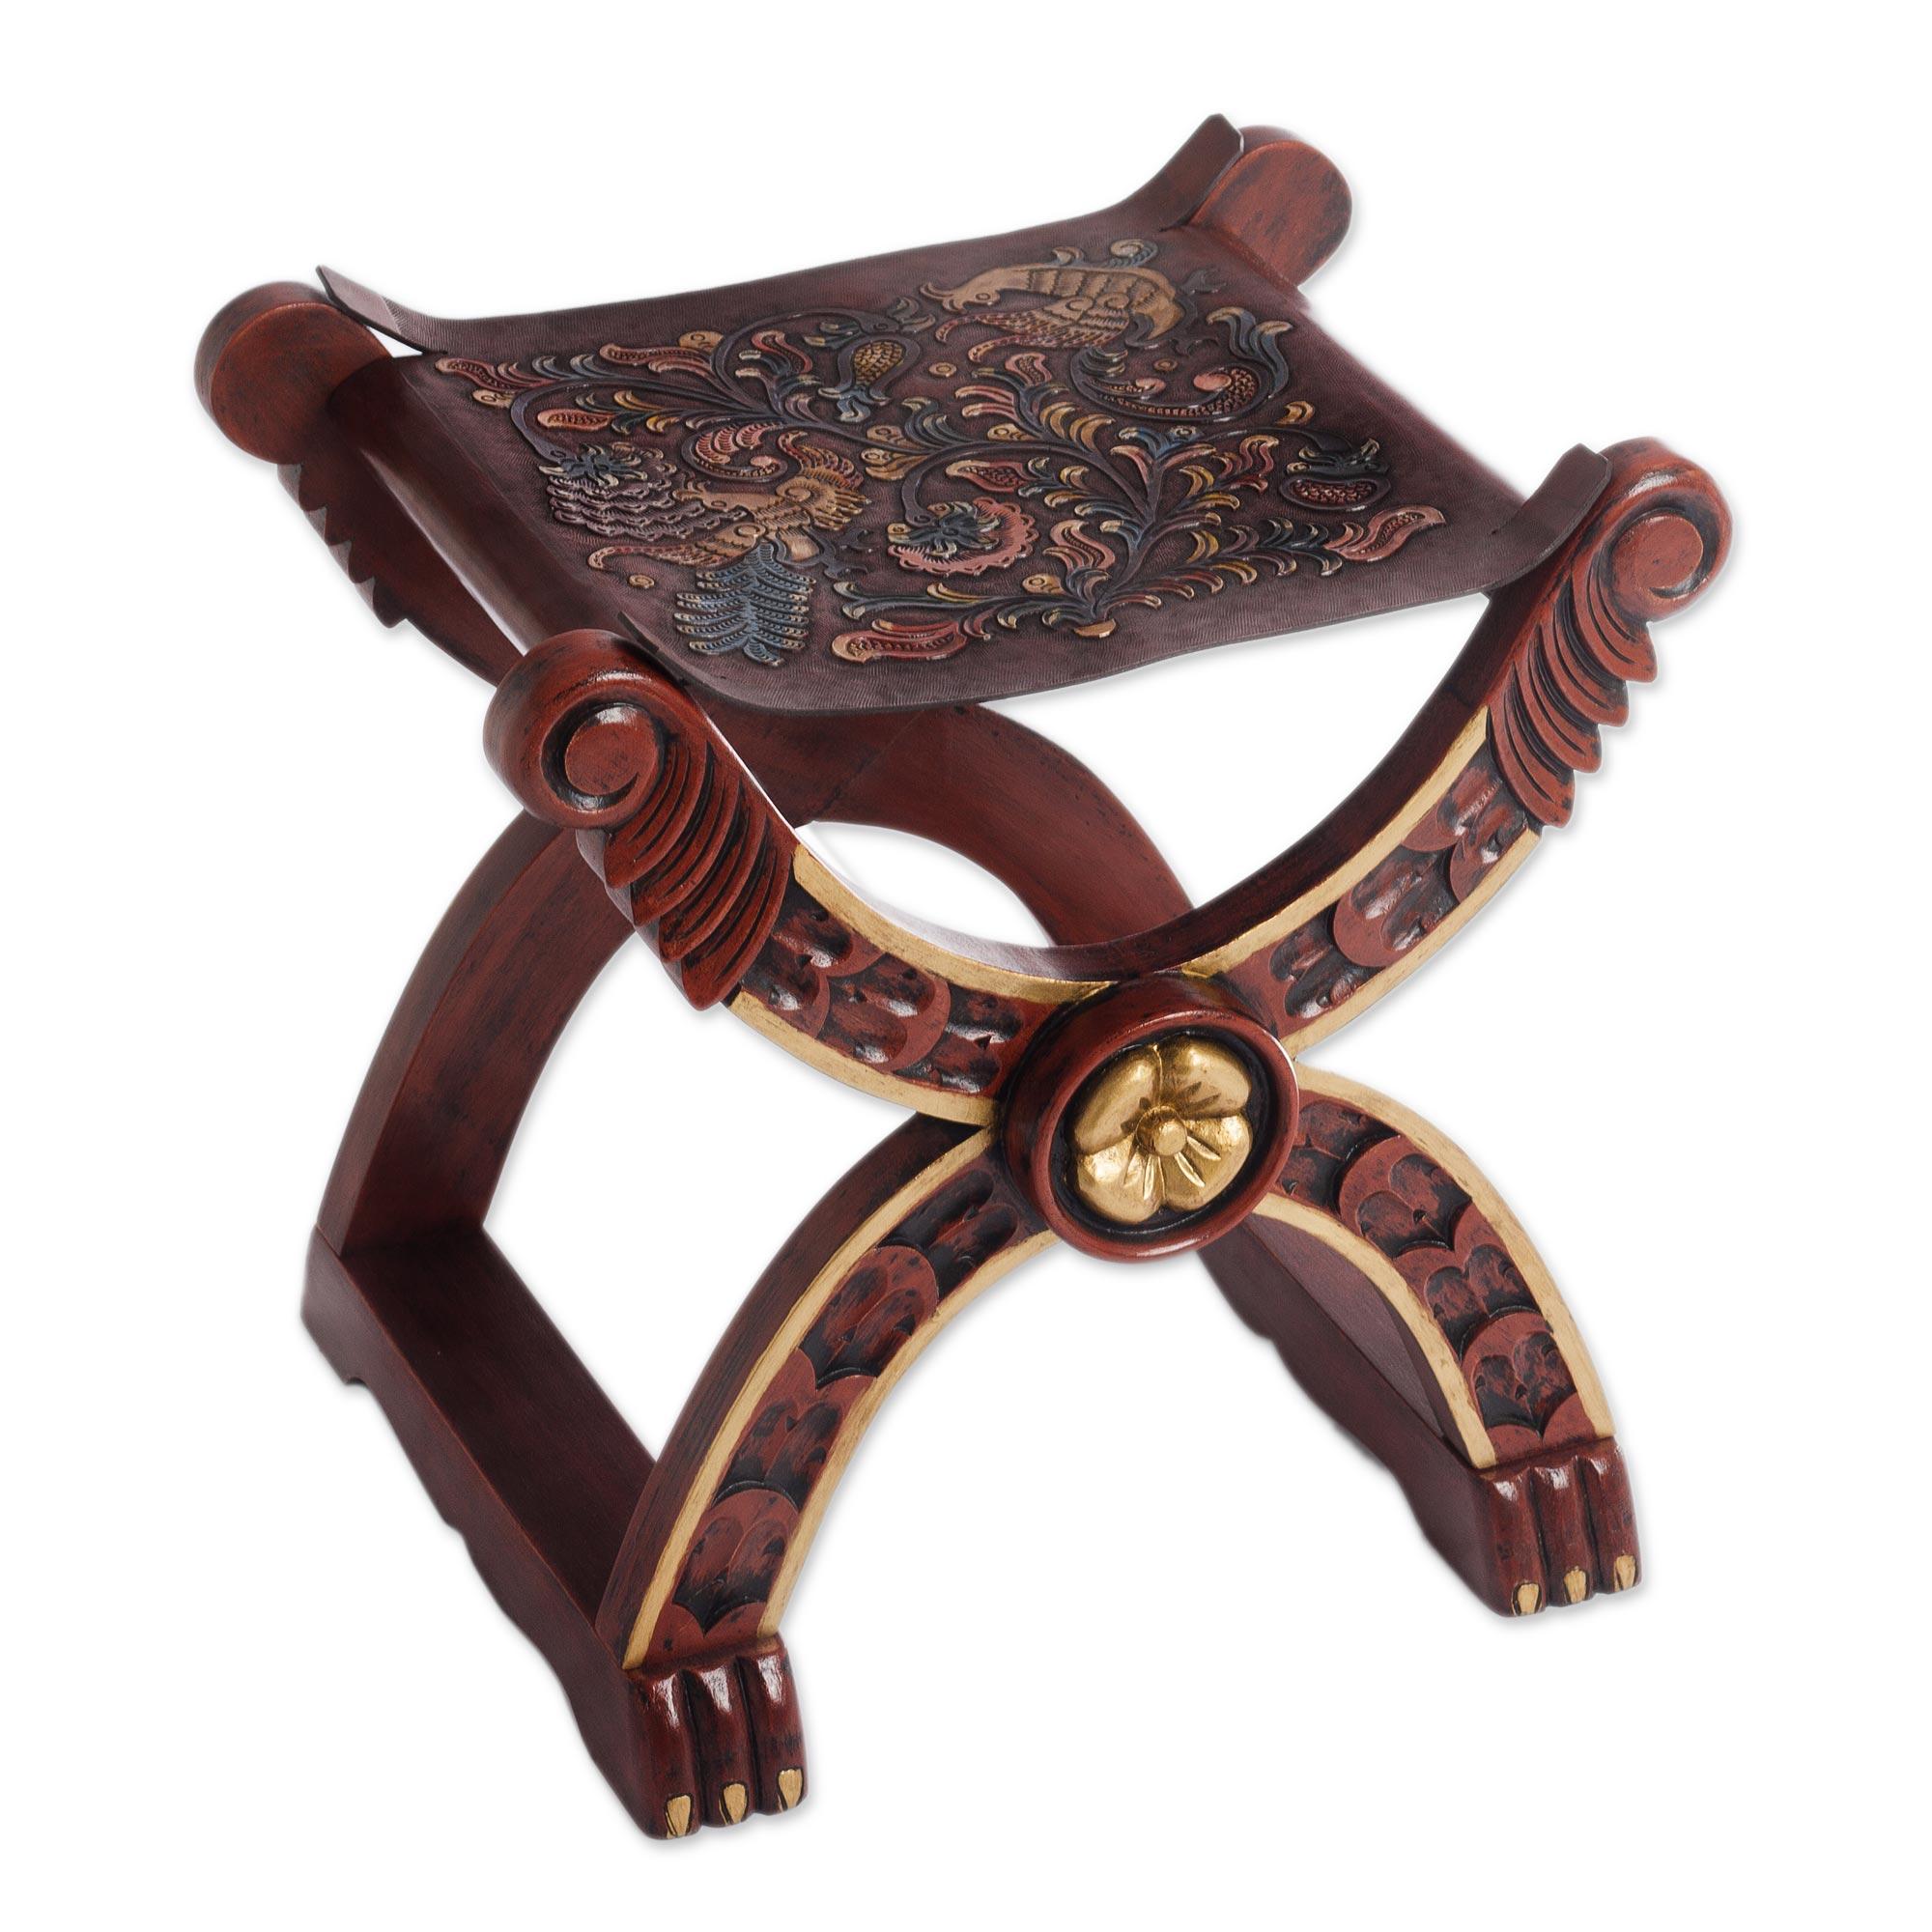 sc 1 st  Novica & Handcrafted Peruvian Wood Leather Stool - Baroque Peru | NOVICA islam-shia.org